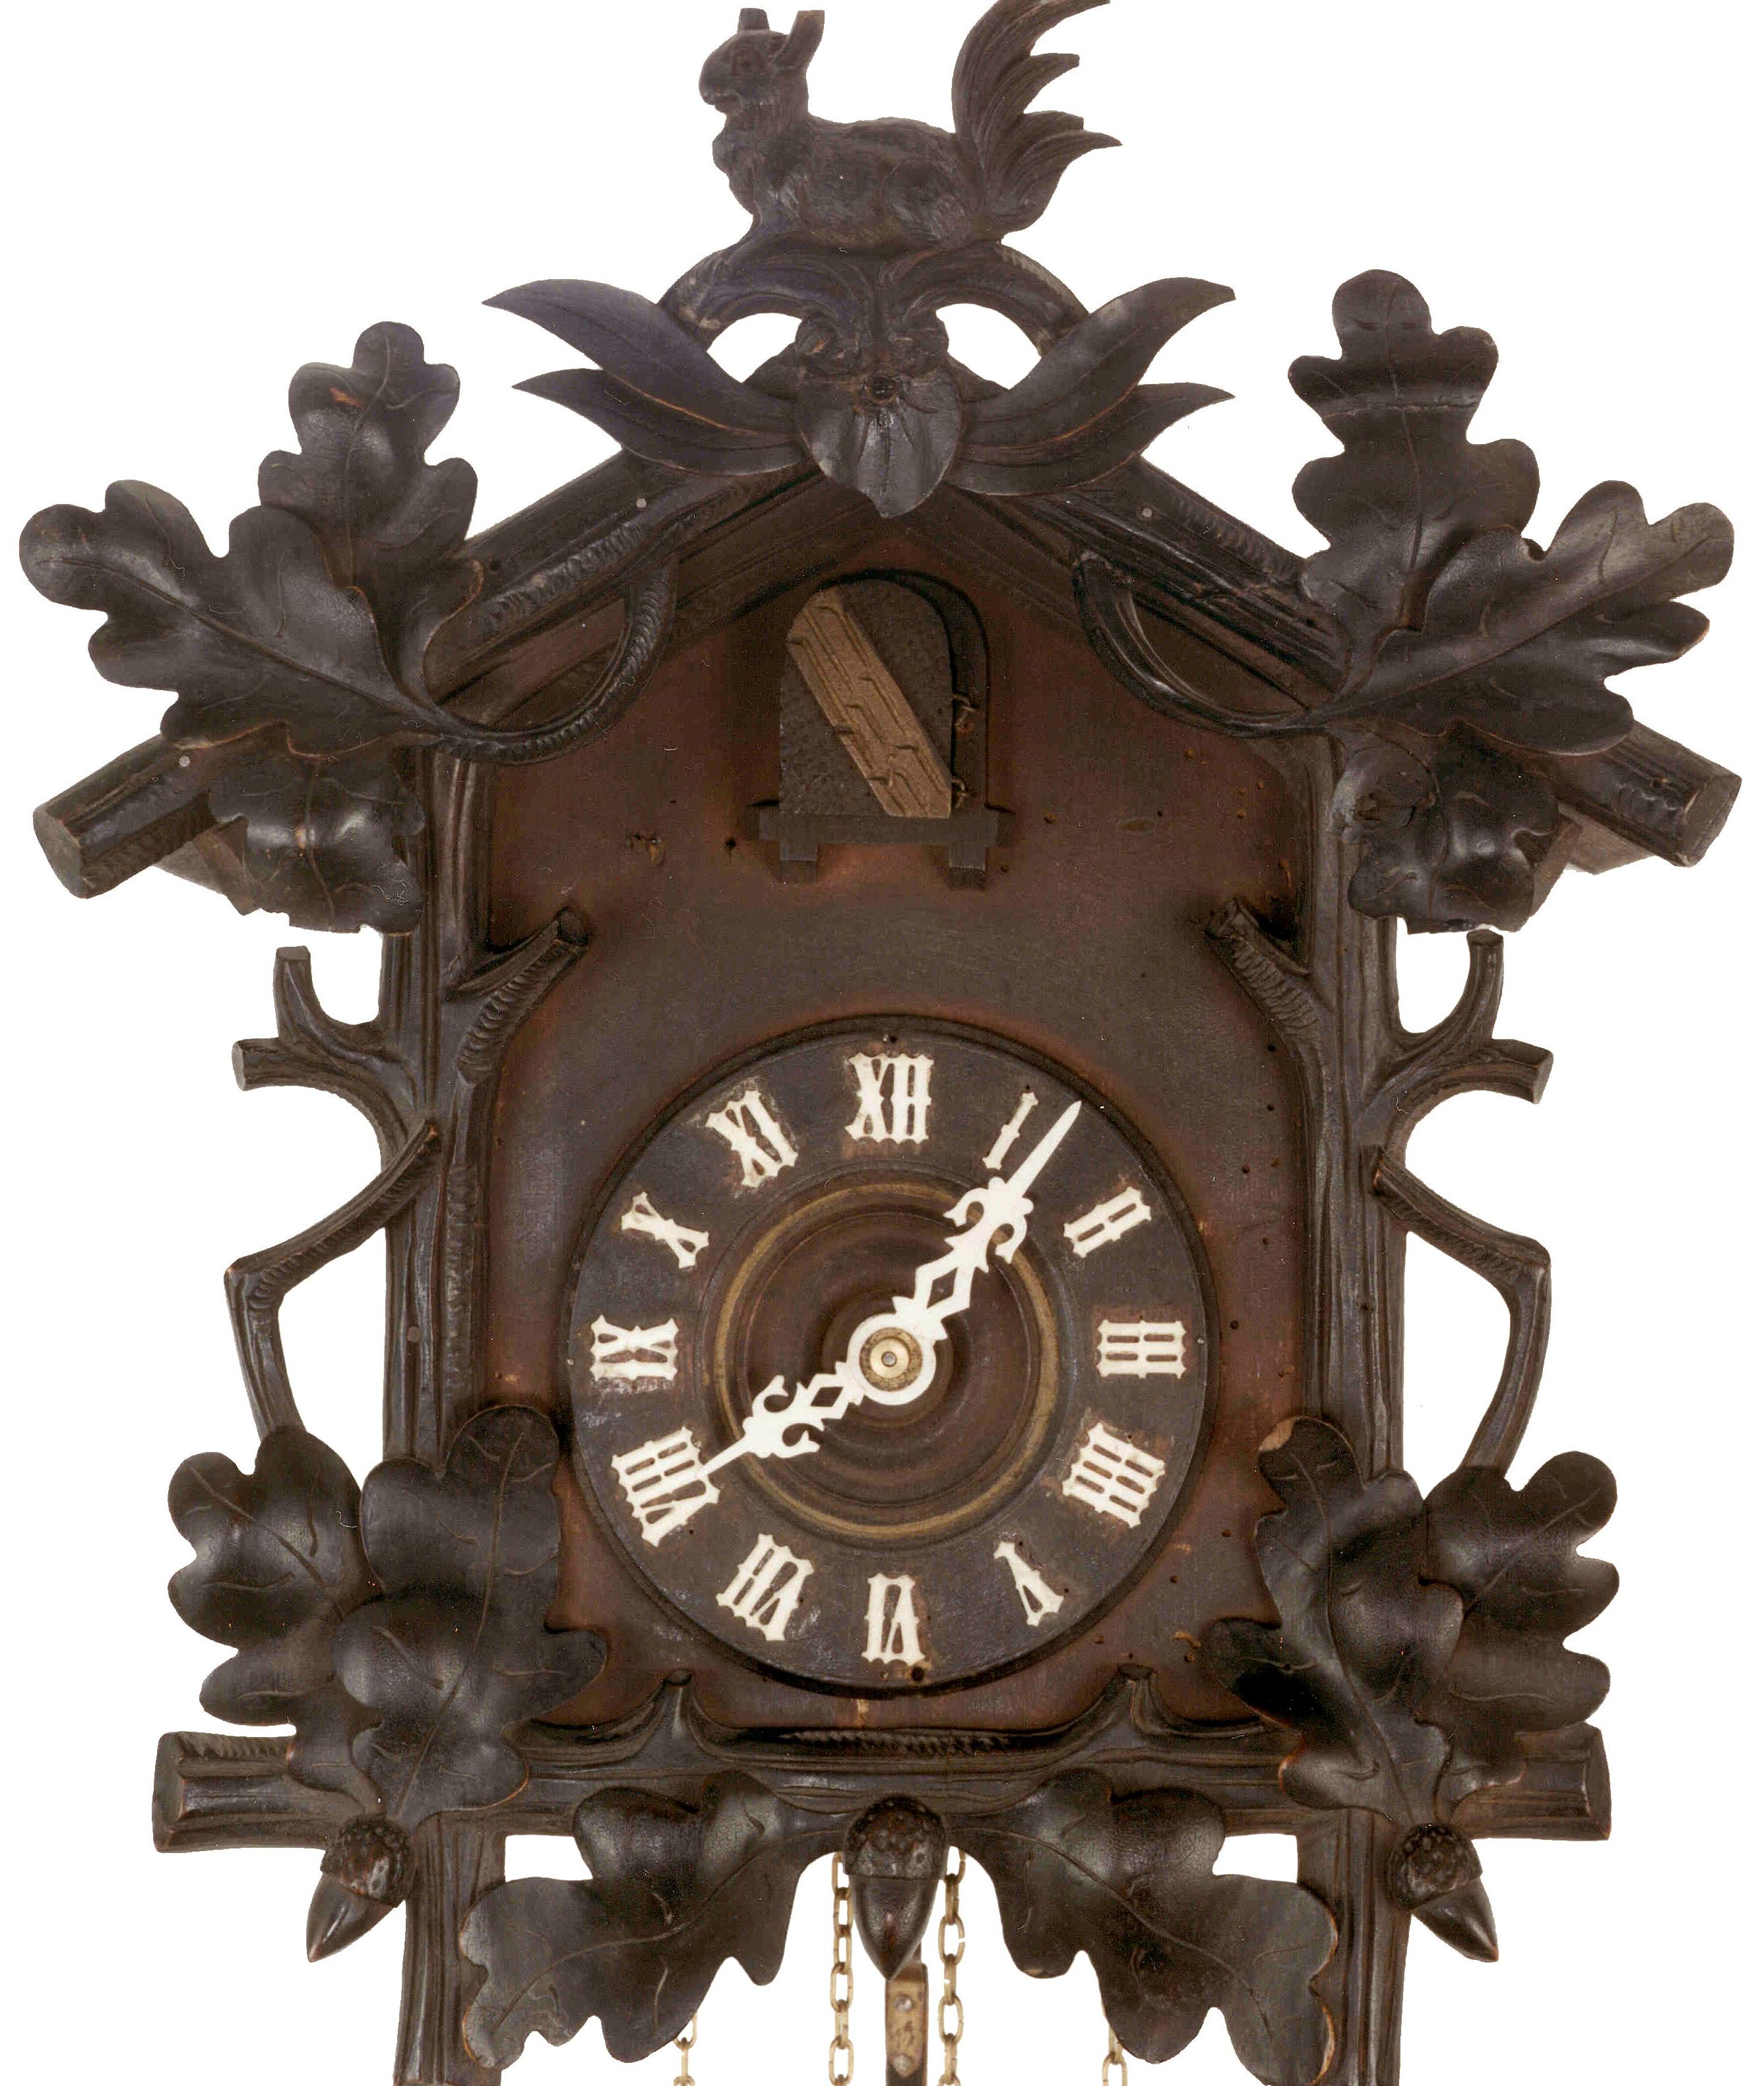 Germany Holidays Cuckoo Clocks Germany Is Wunderbar